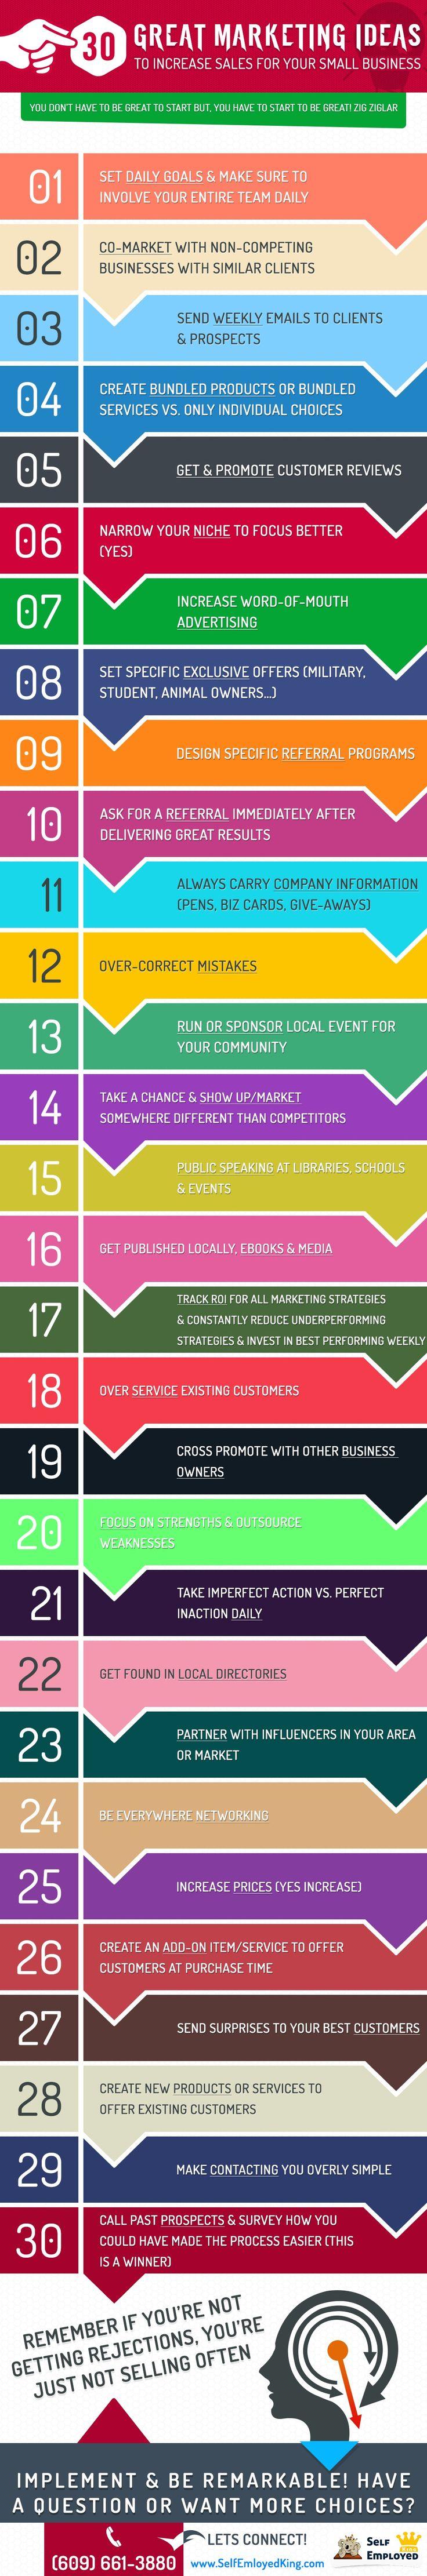 30 small business marketing ideas